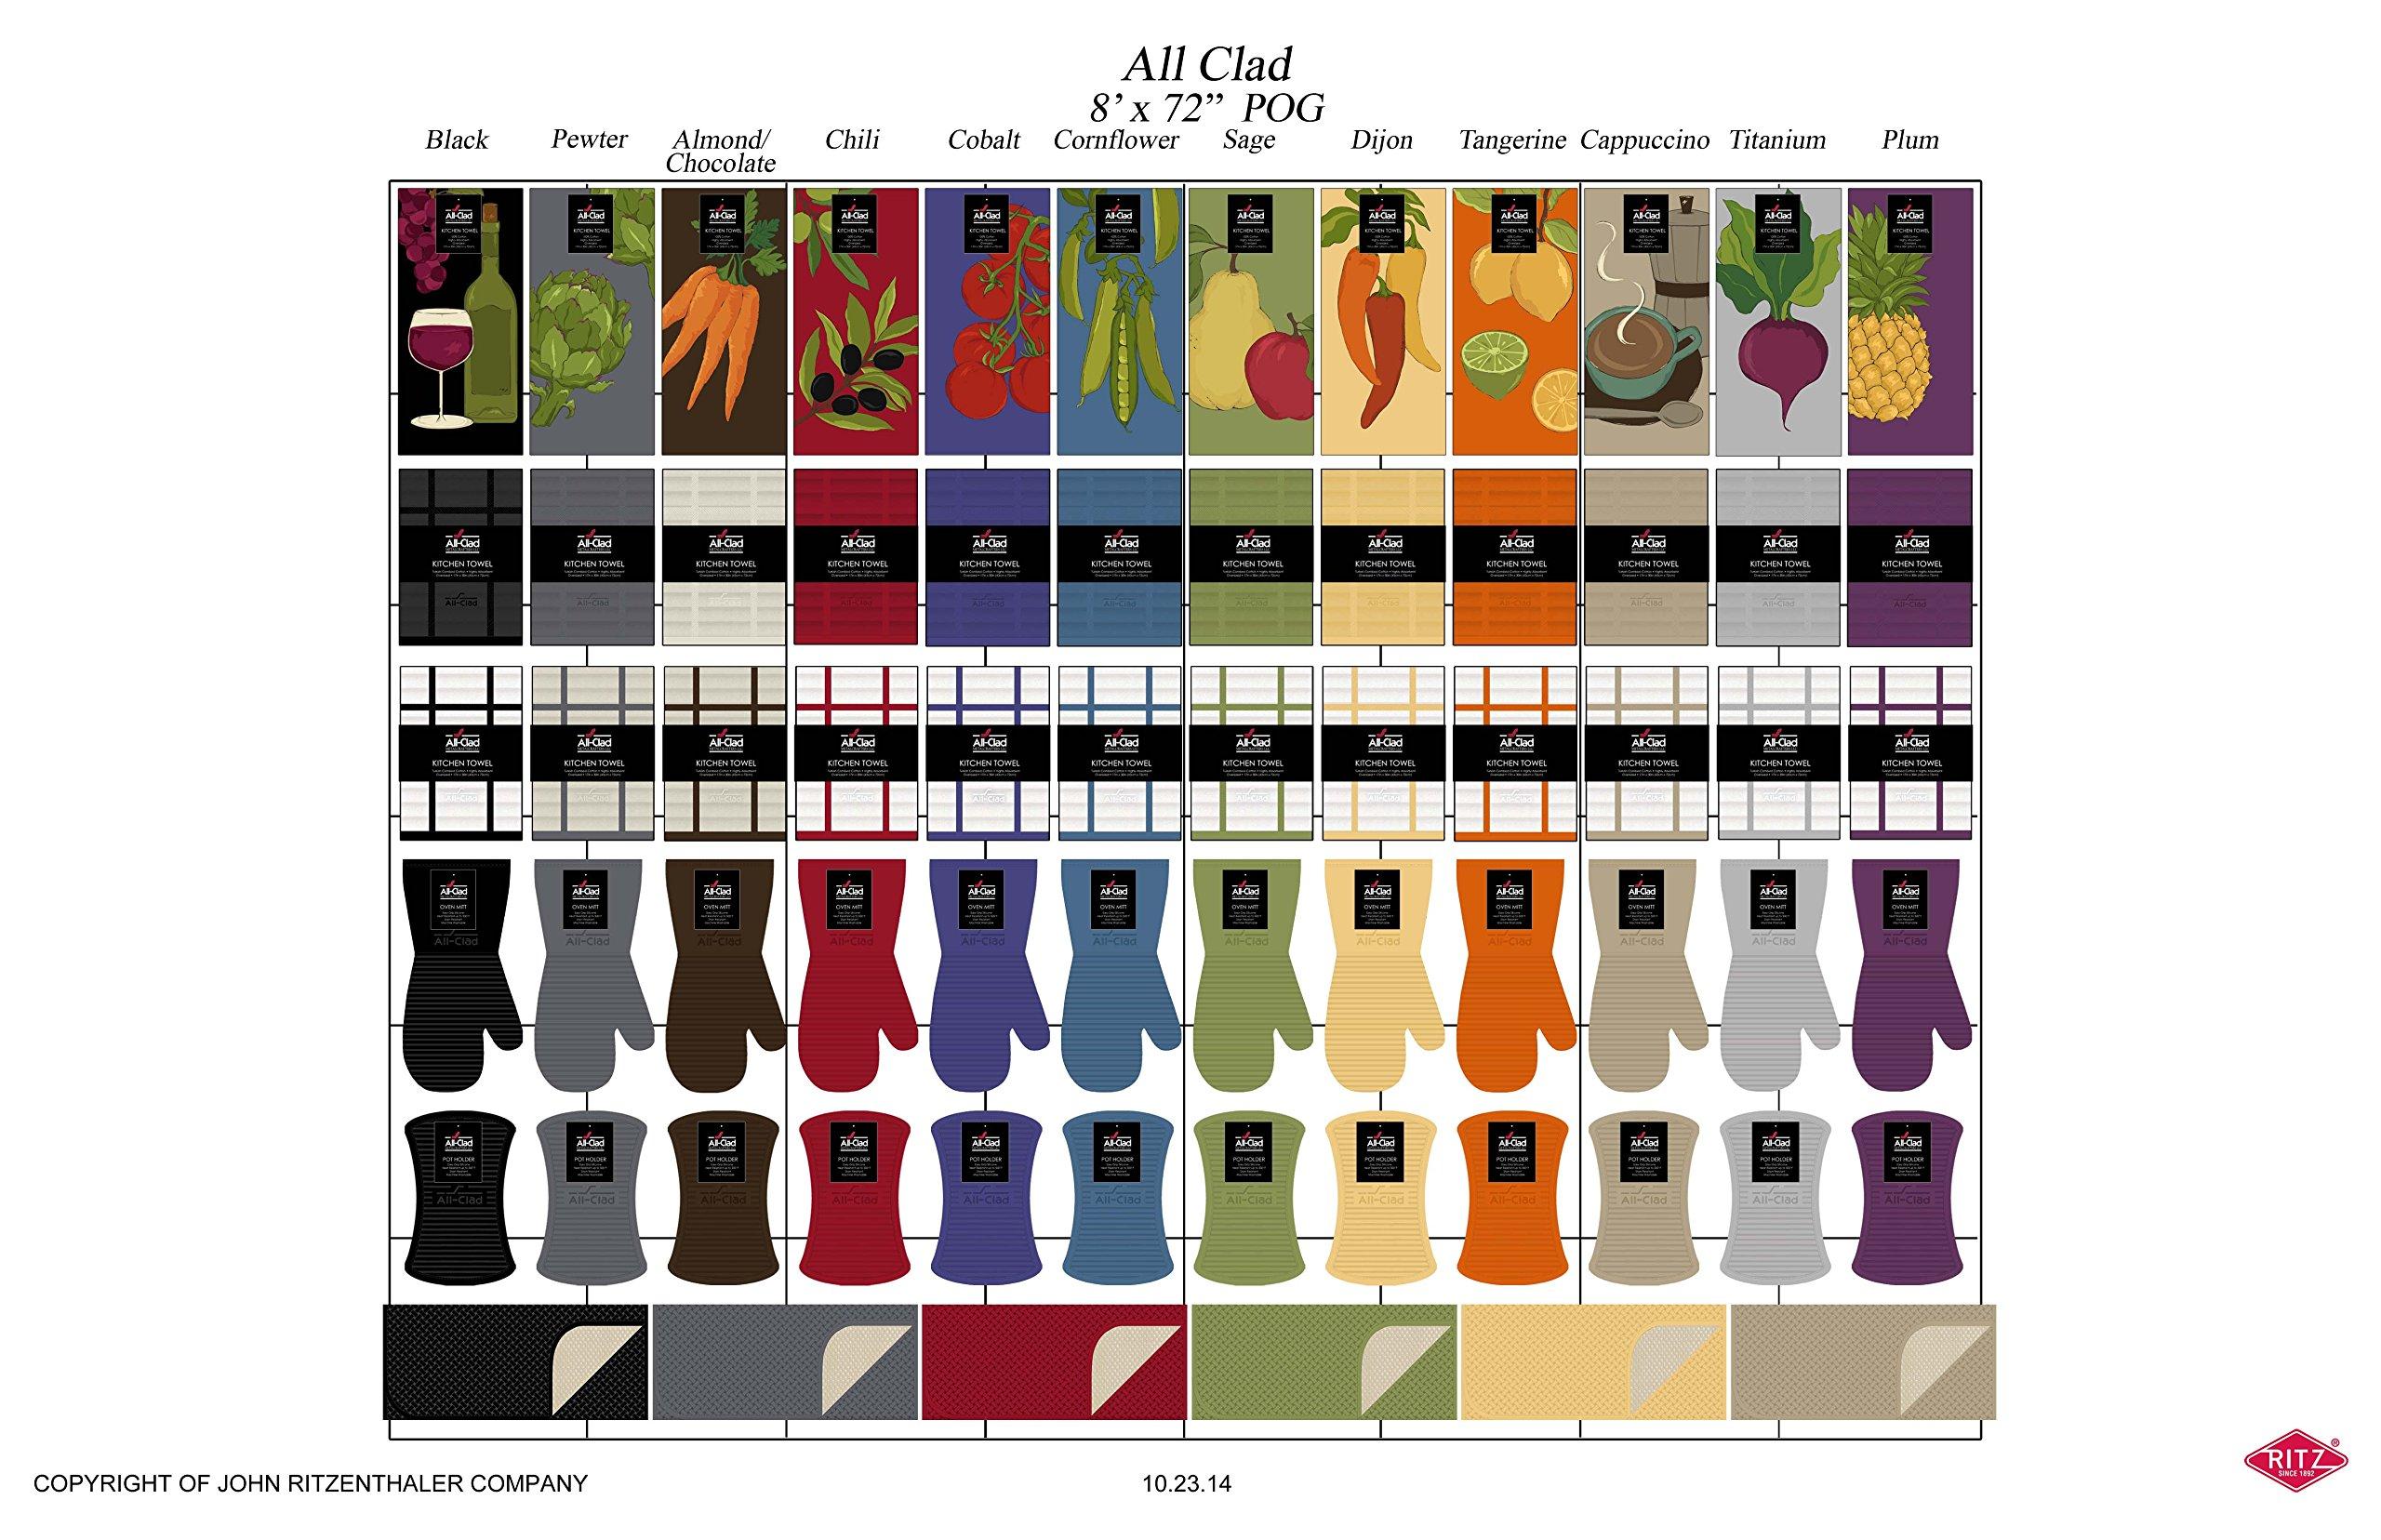 All Clad Kitchen Towel Sets Amazon